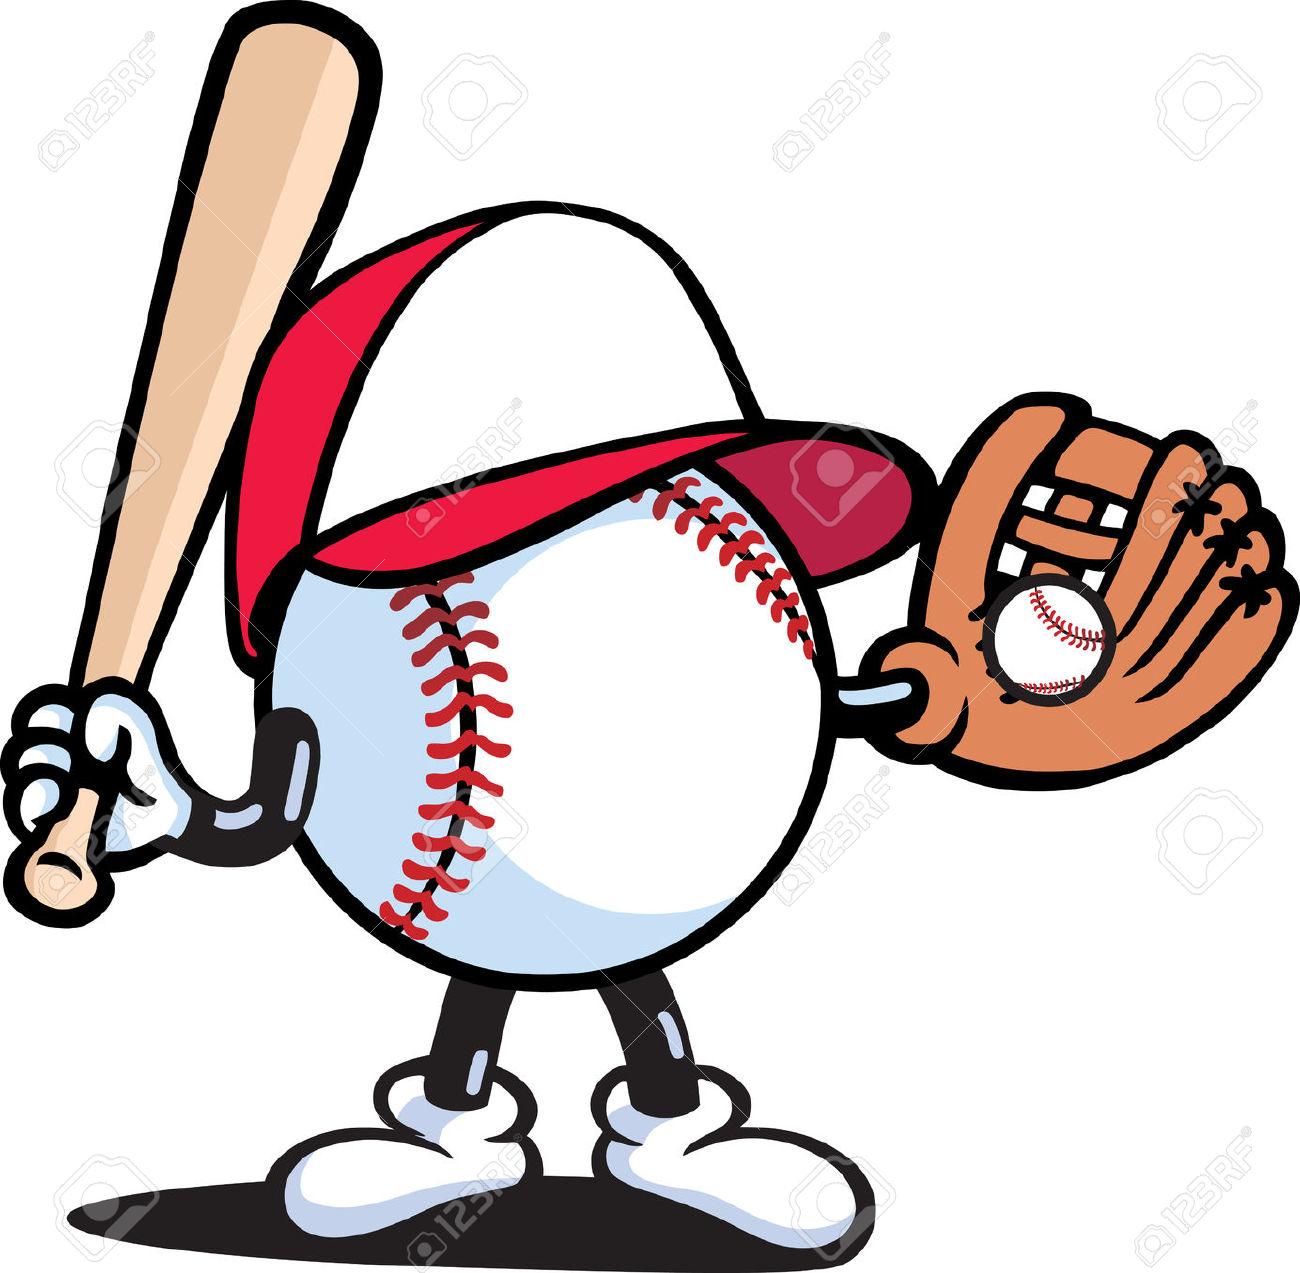 1300x1273 Baseball Cartoon Drawings Baseball Bat Stock Photos, Pictures